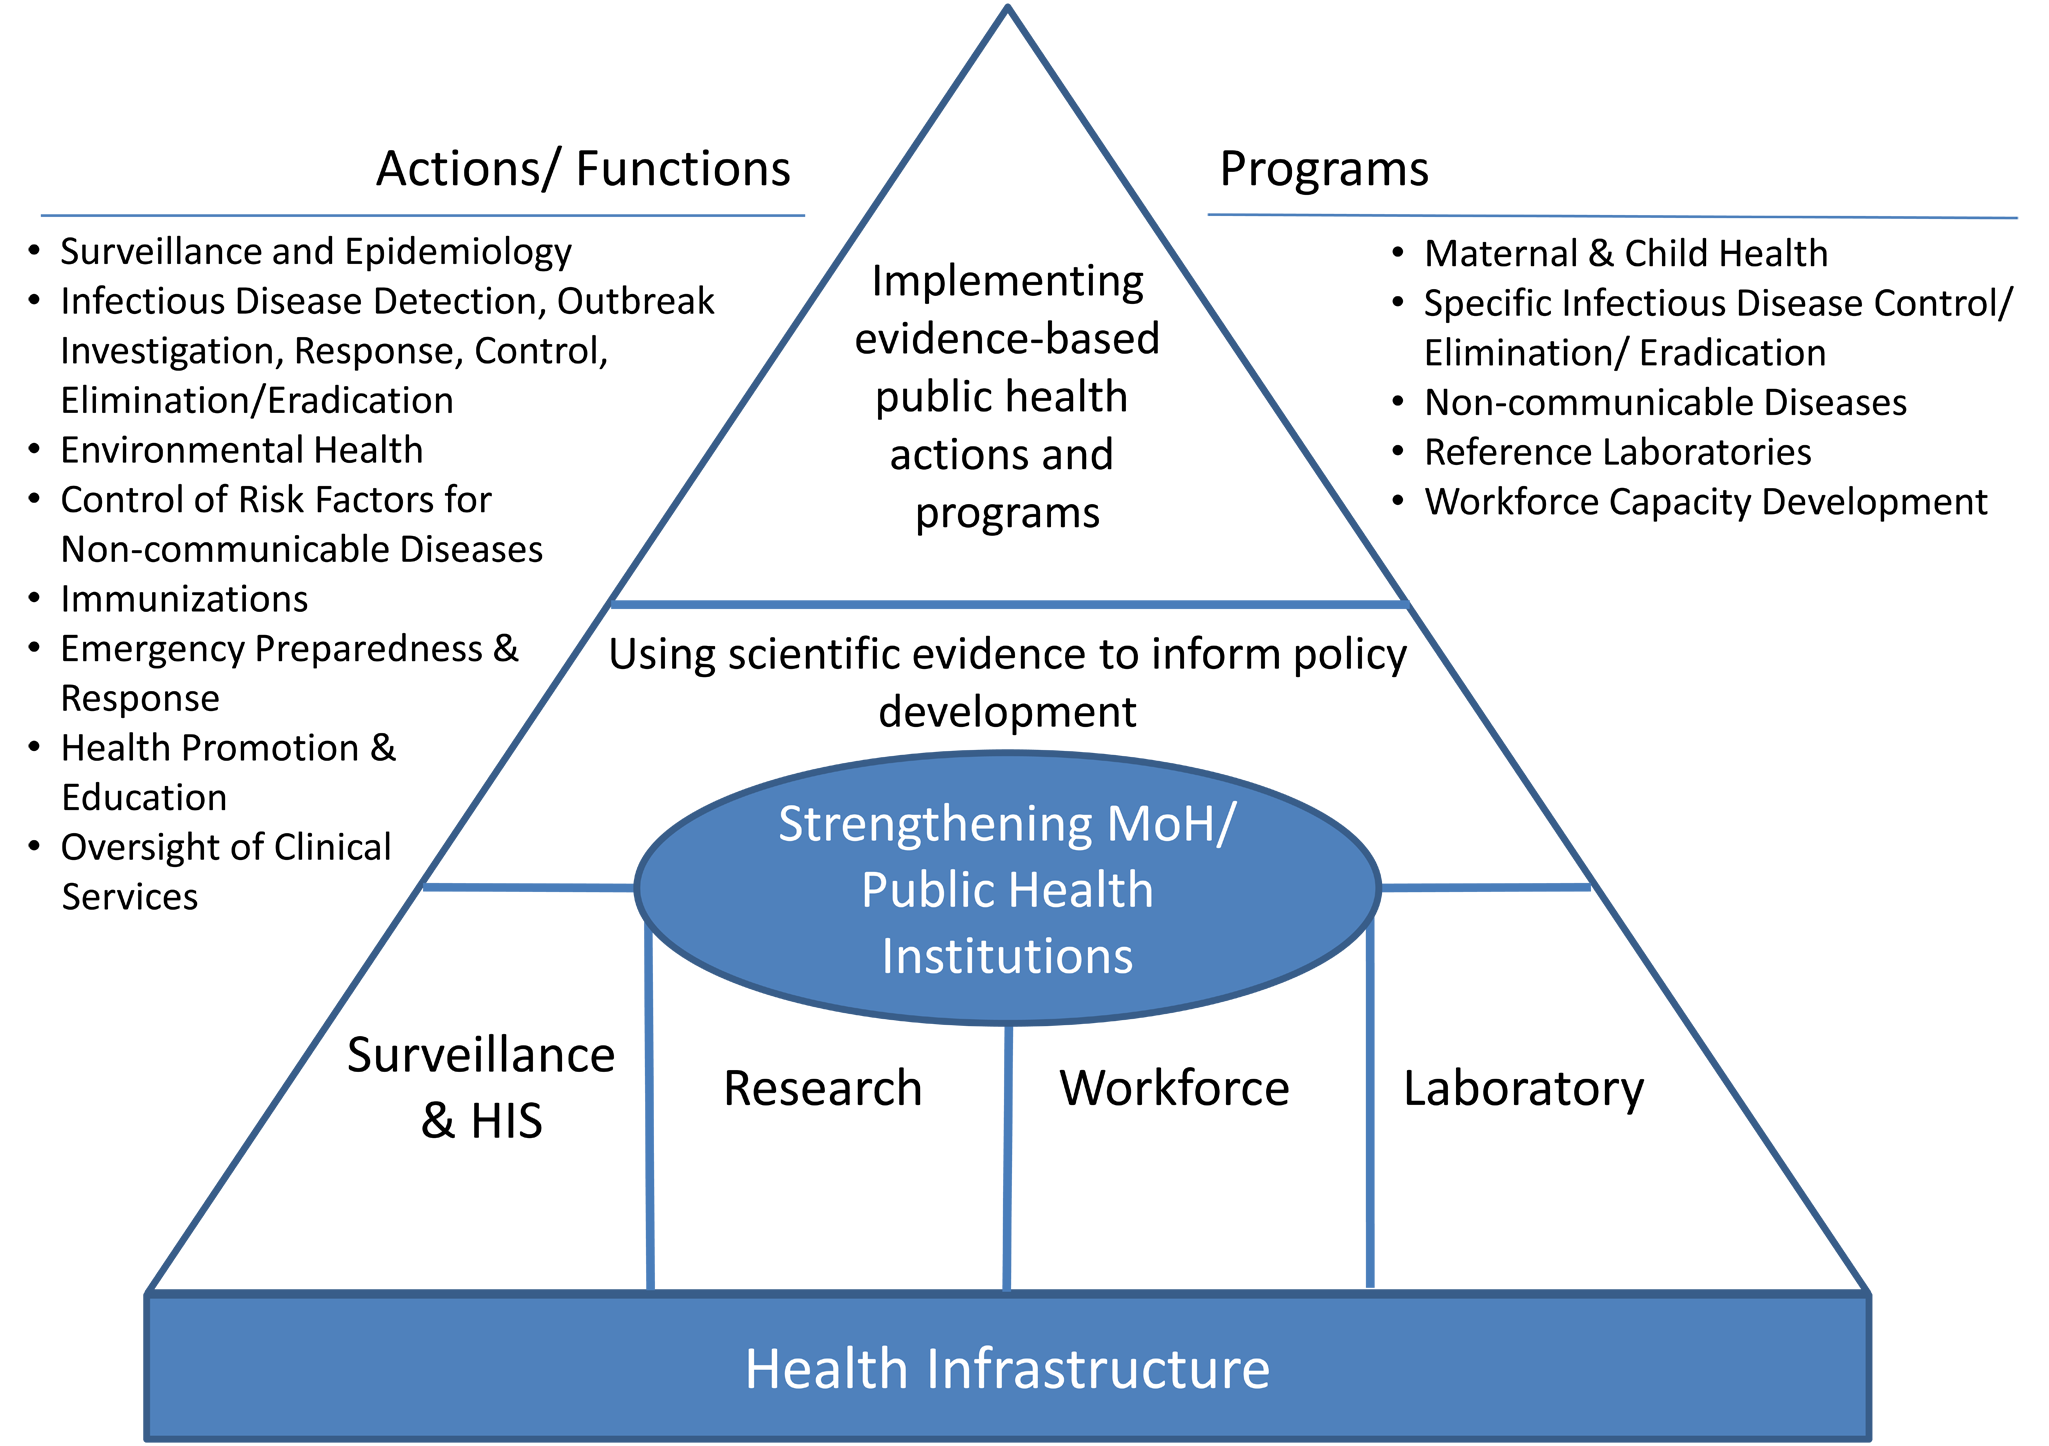 Public health framework for health systems strengthening.